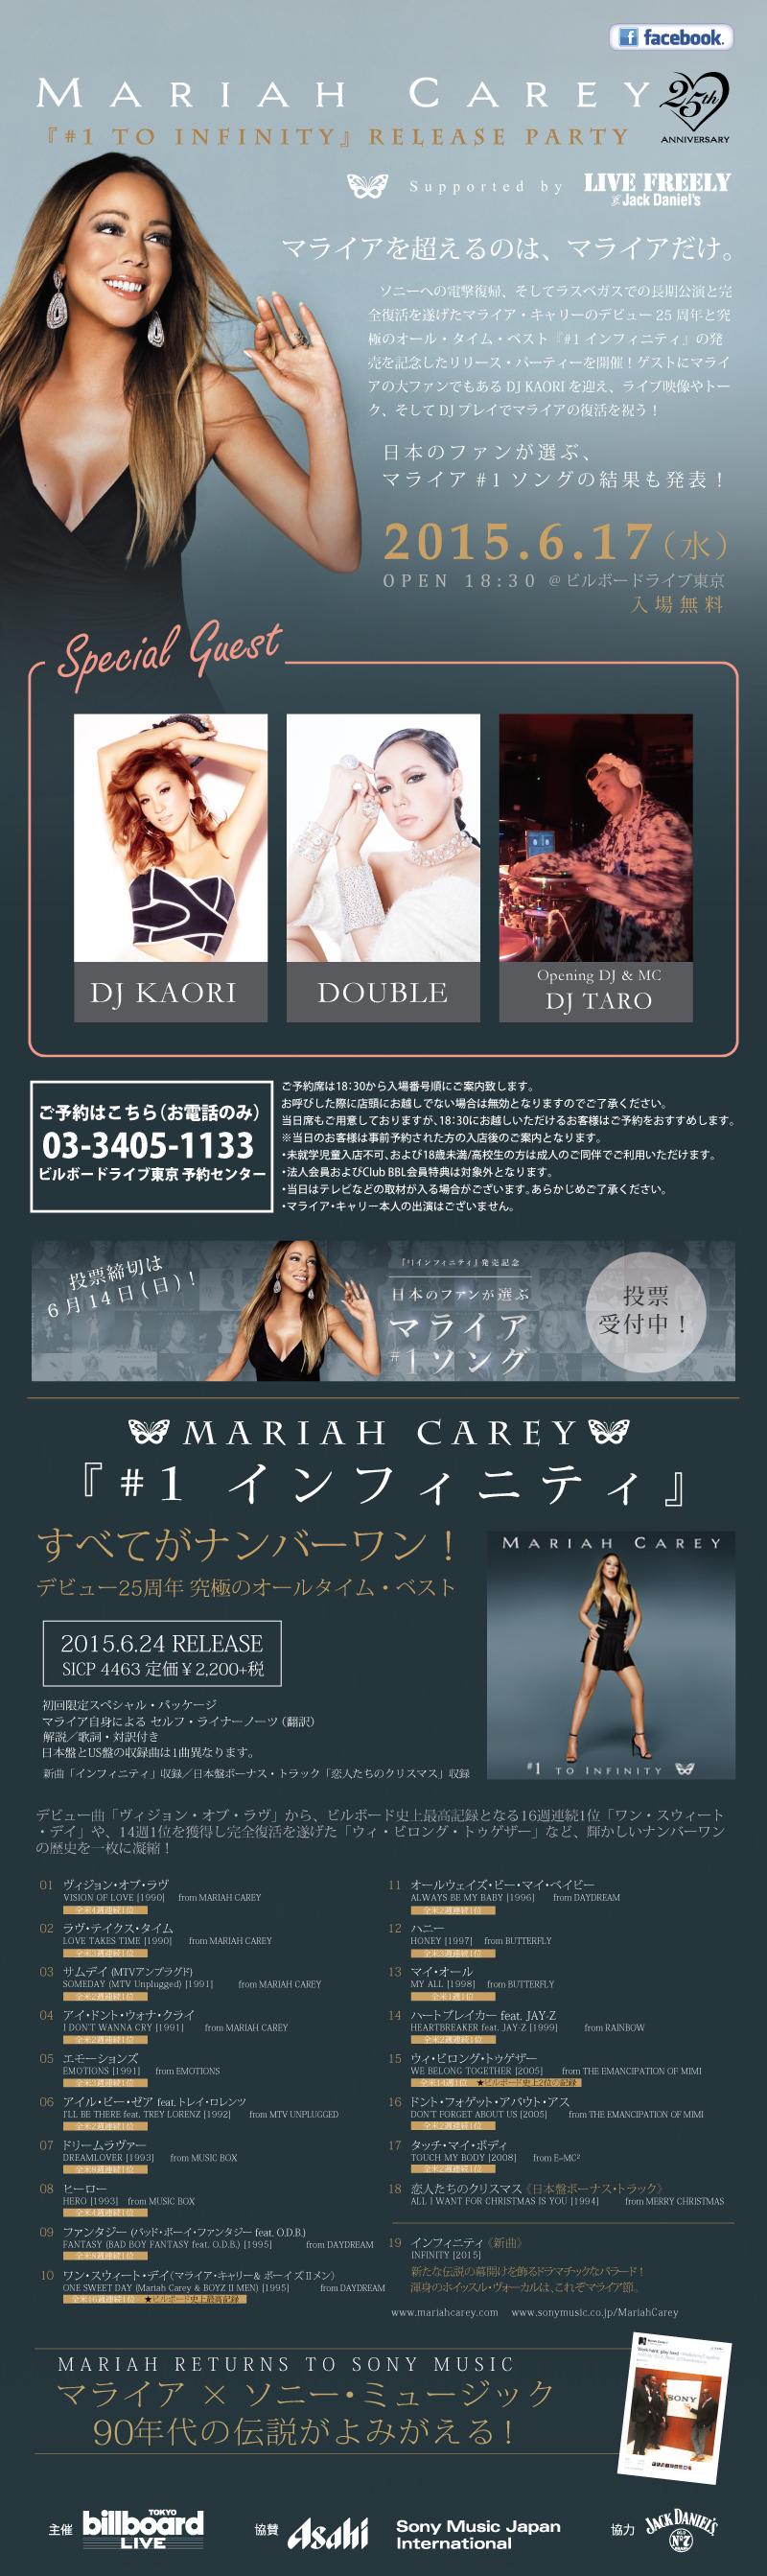 Mariah Carey『#1 to Infinity』Release Party Mariah Carey Video